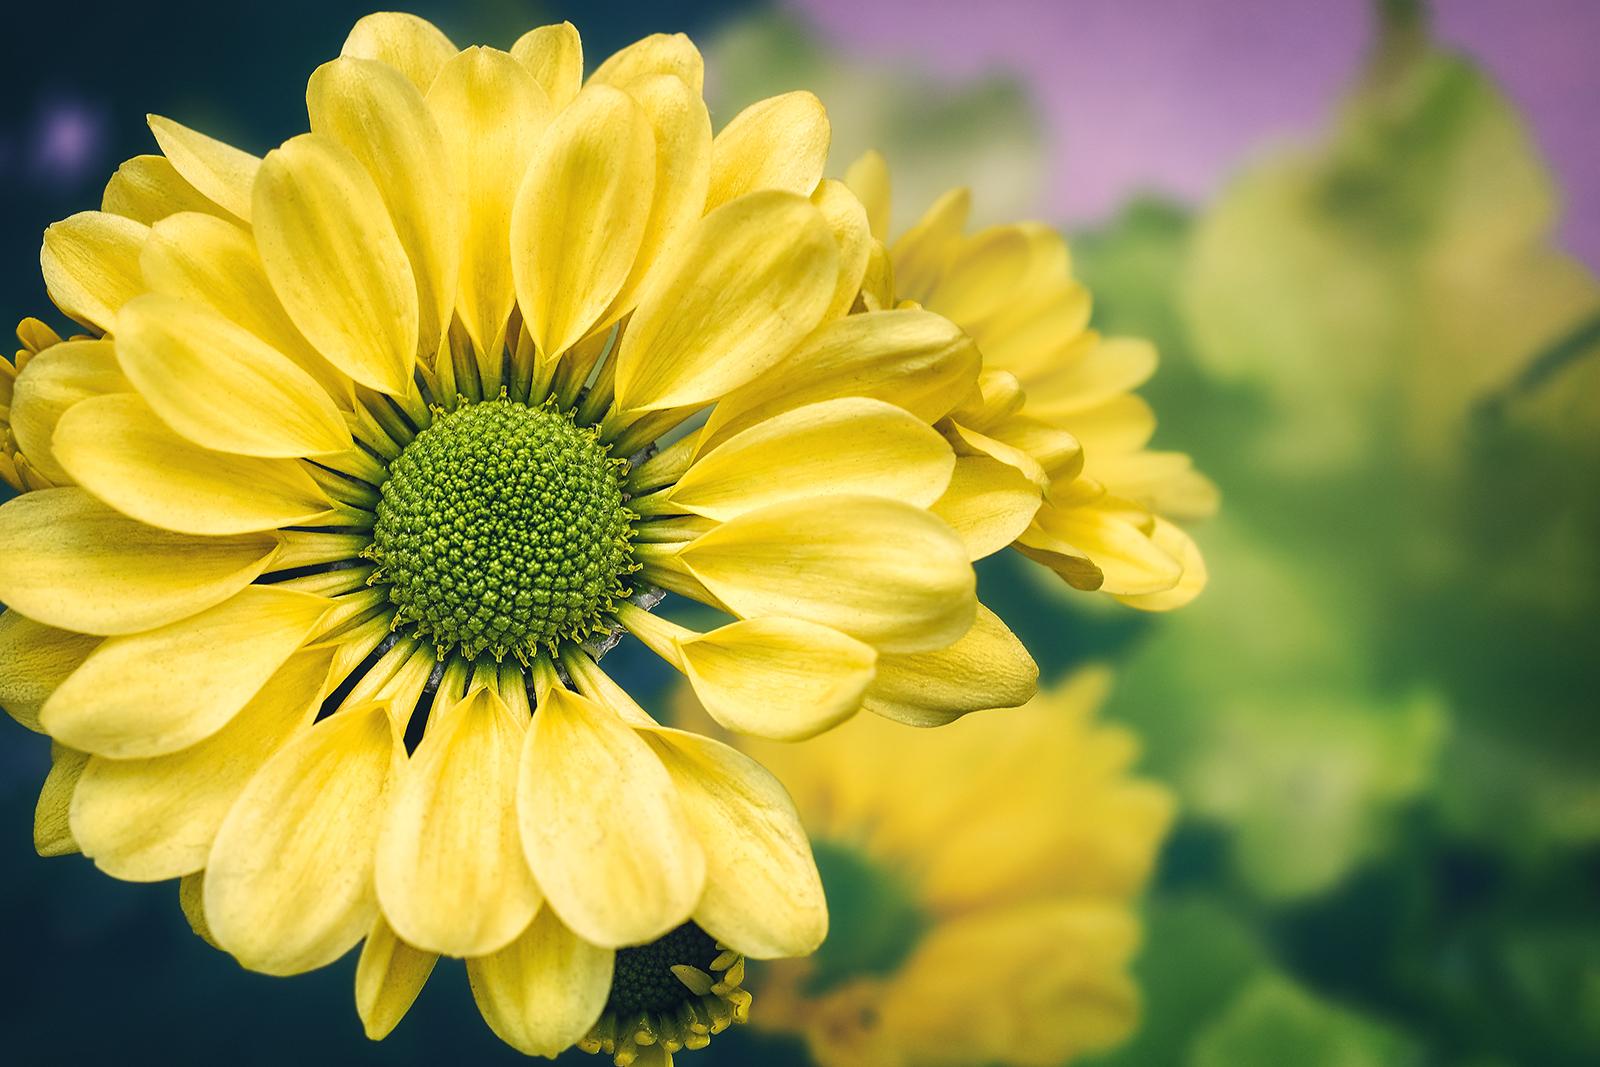 Closeup of a Yellow Chrysanthemum Flower